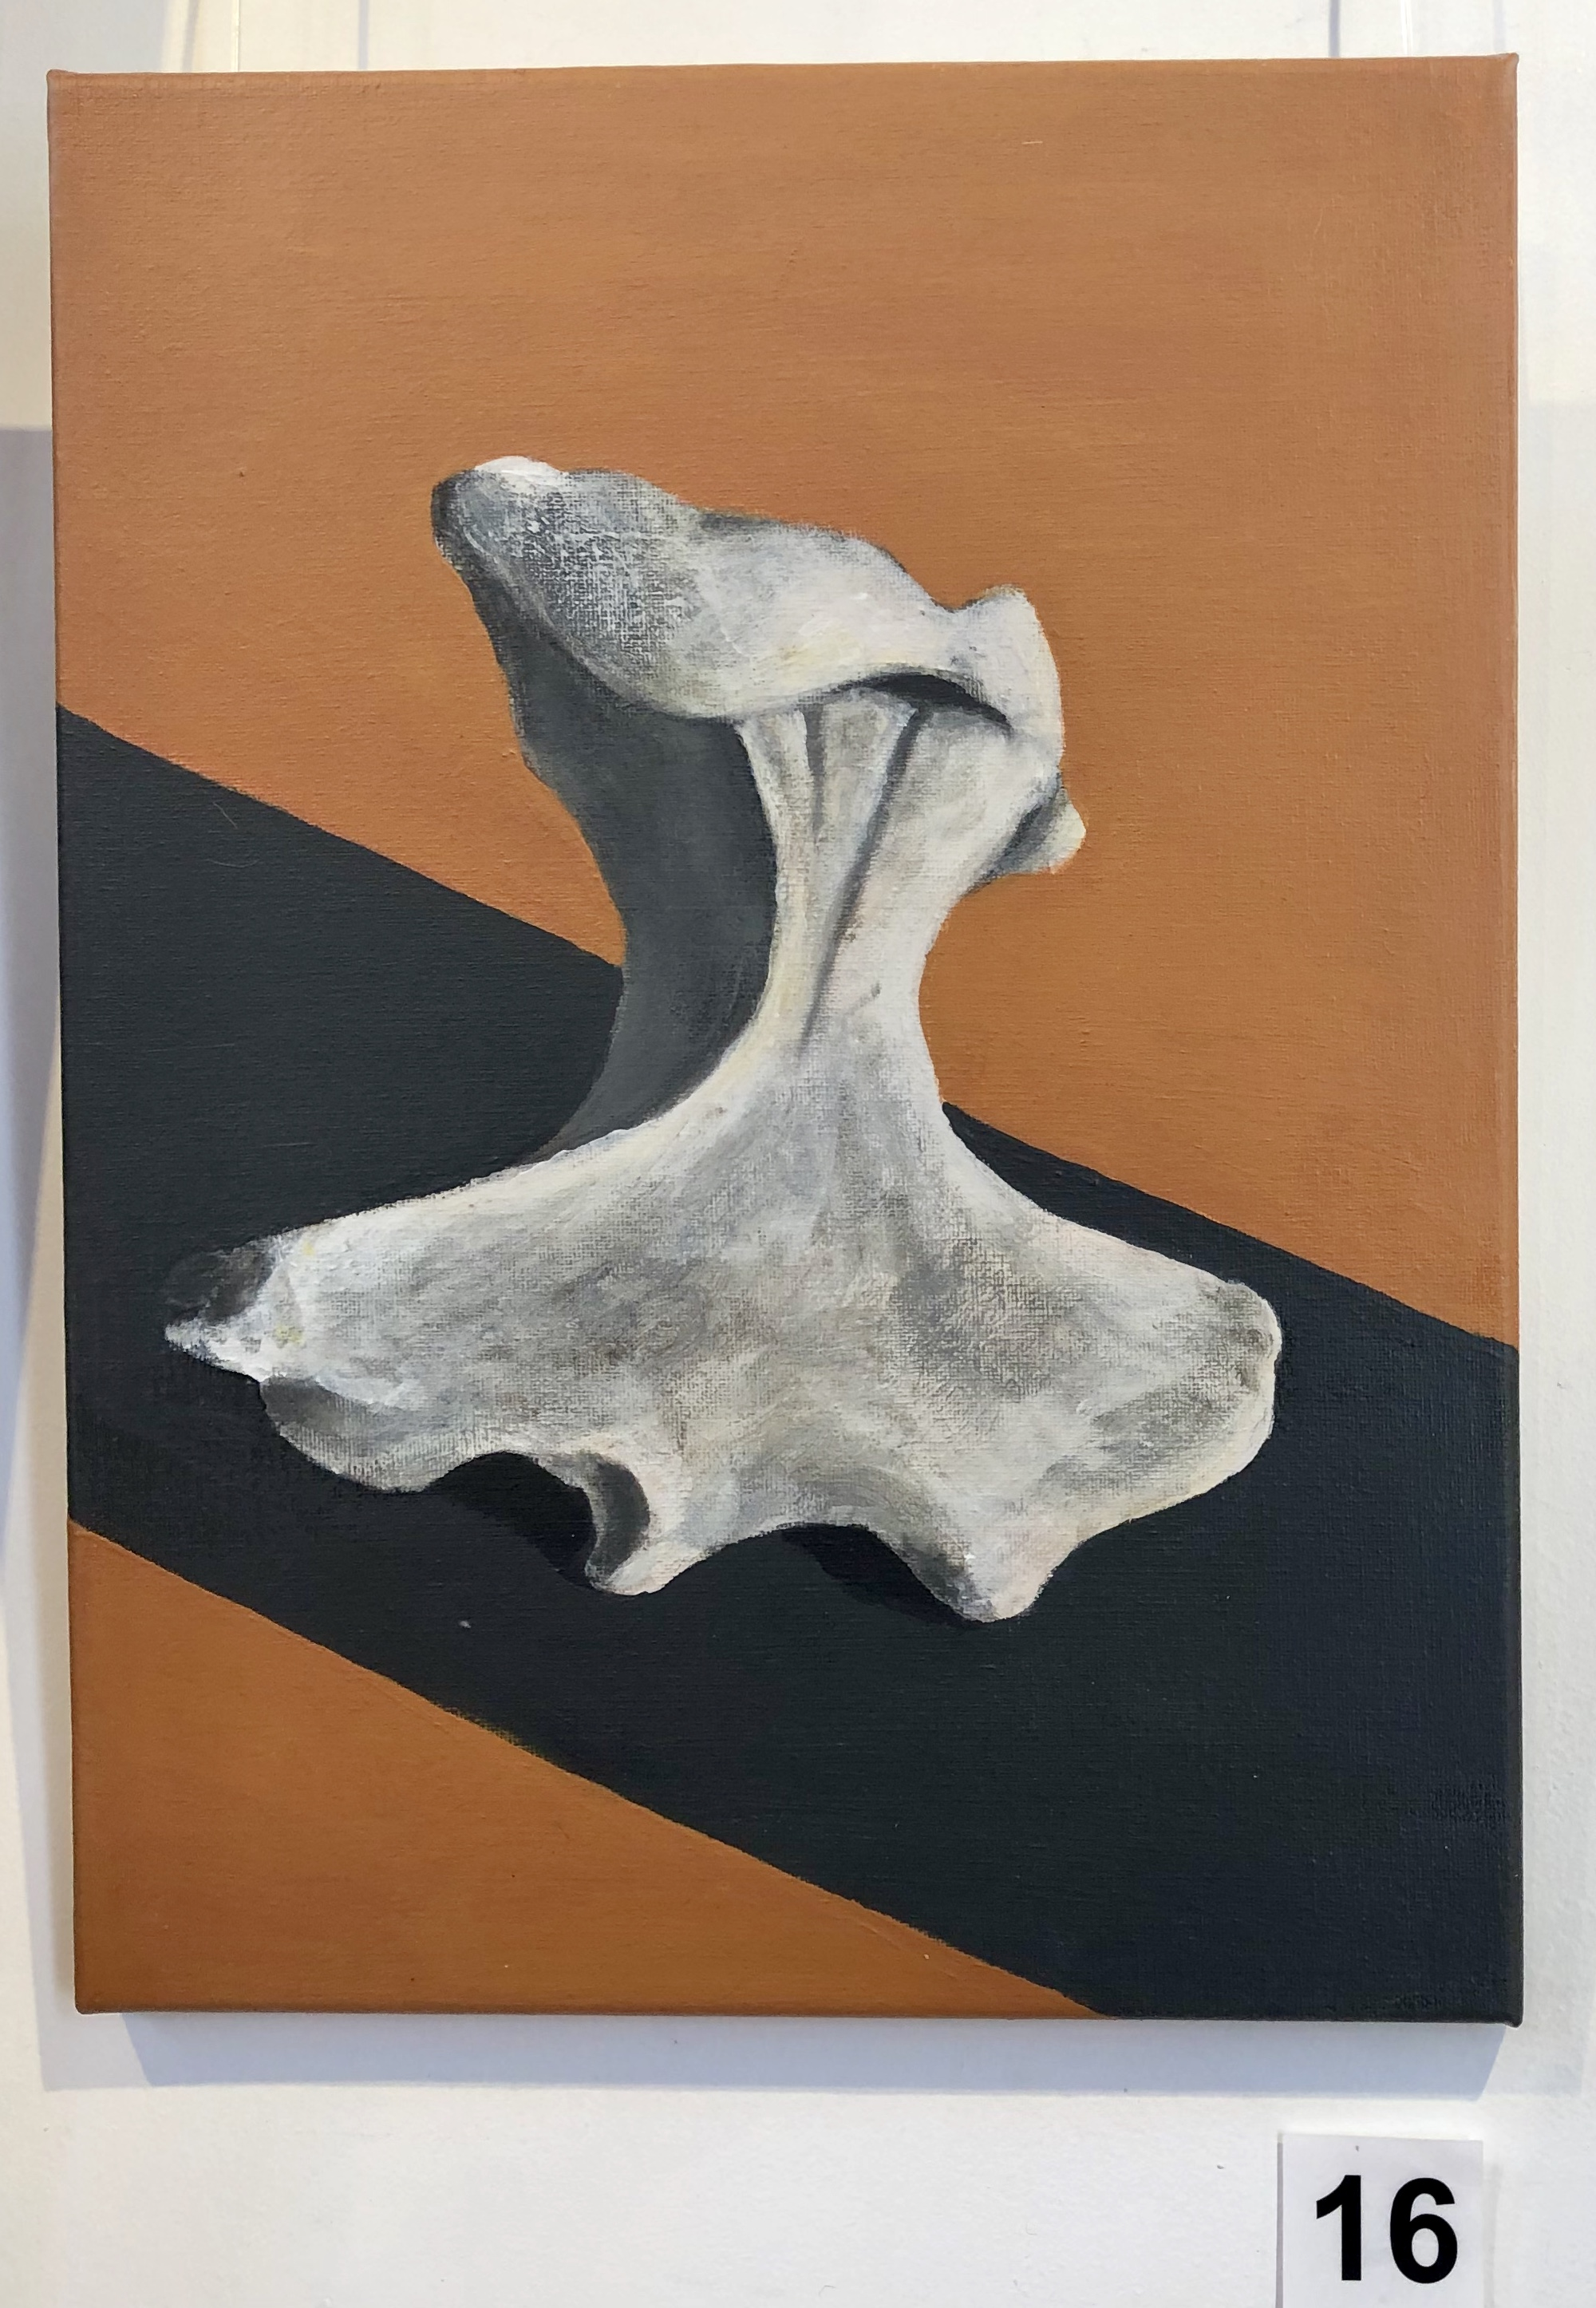 """Humerus - Echidna"" by Lisa Timms Stevens"